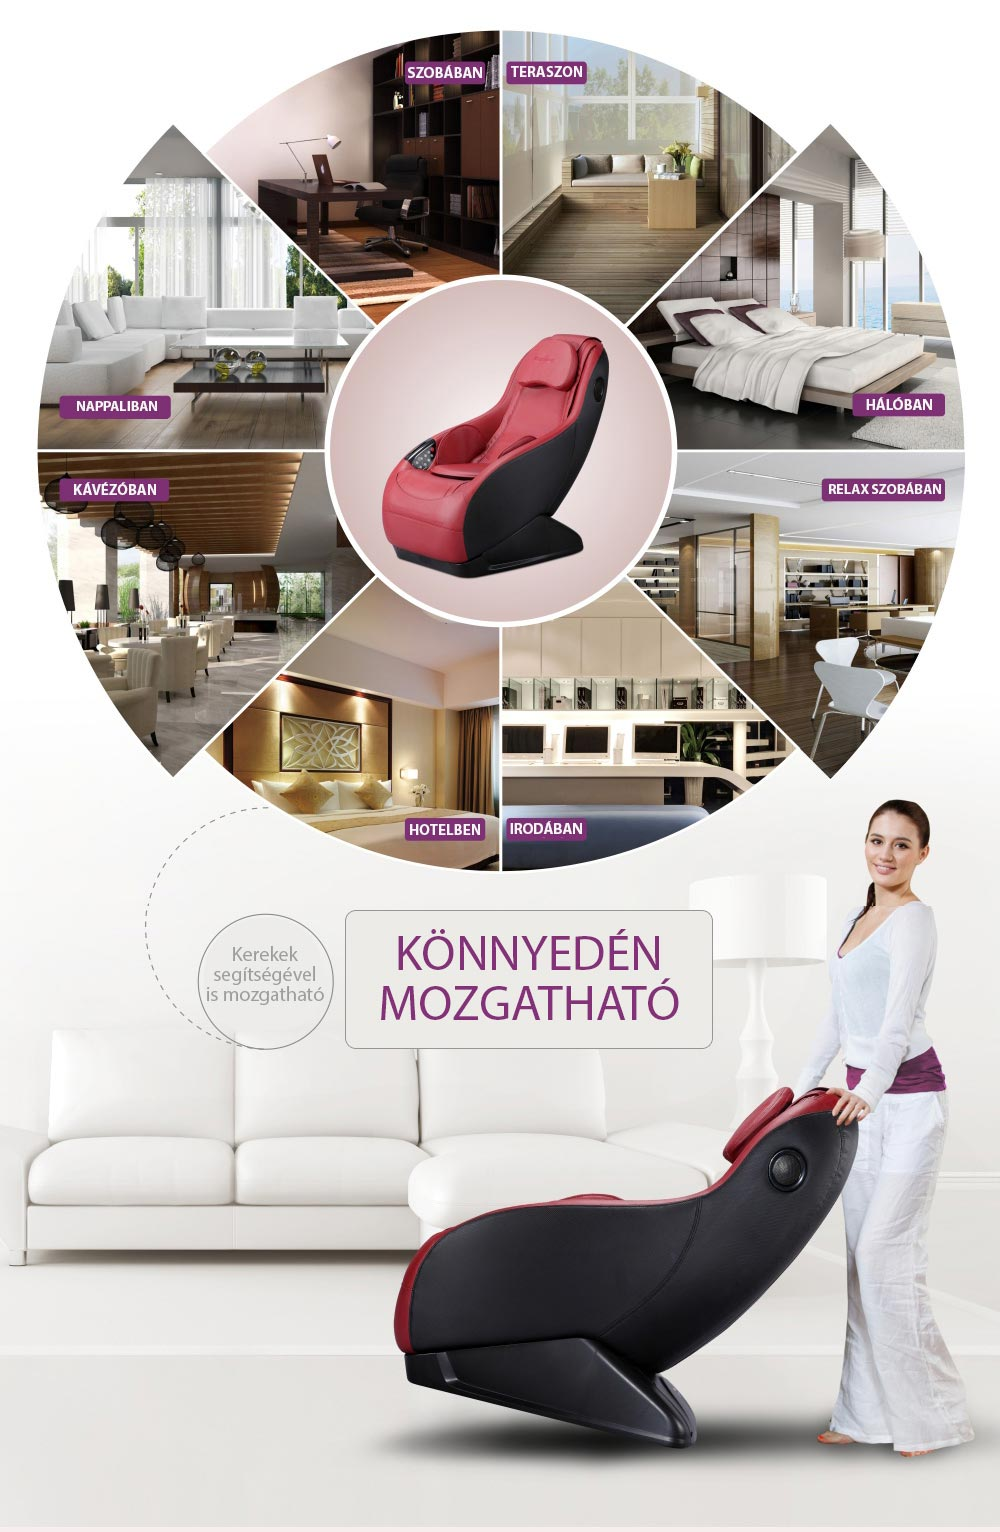 bionwell-palermo-masszazsfotel-kerekei-segitsegevel-konnyeden-mozgathato-iroda-szoba-nappali